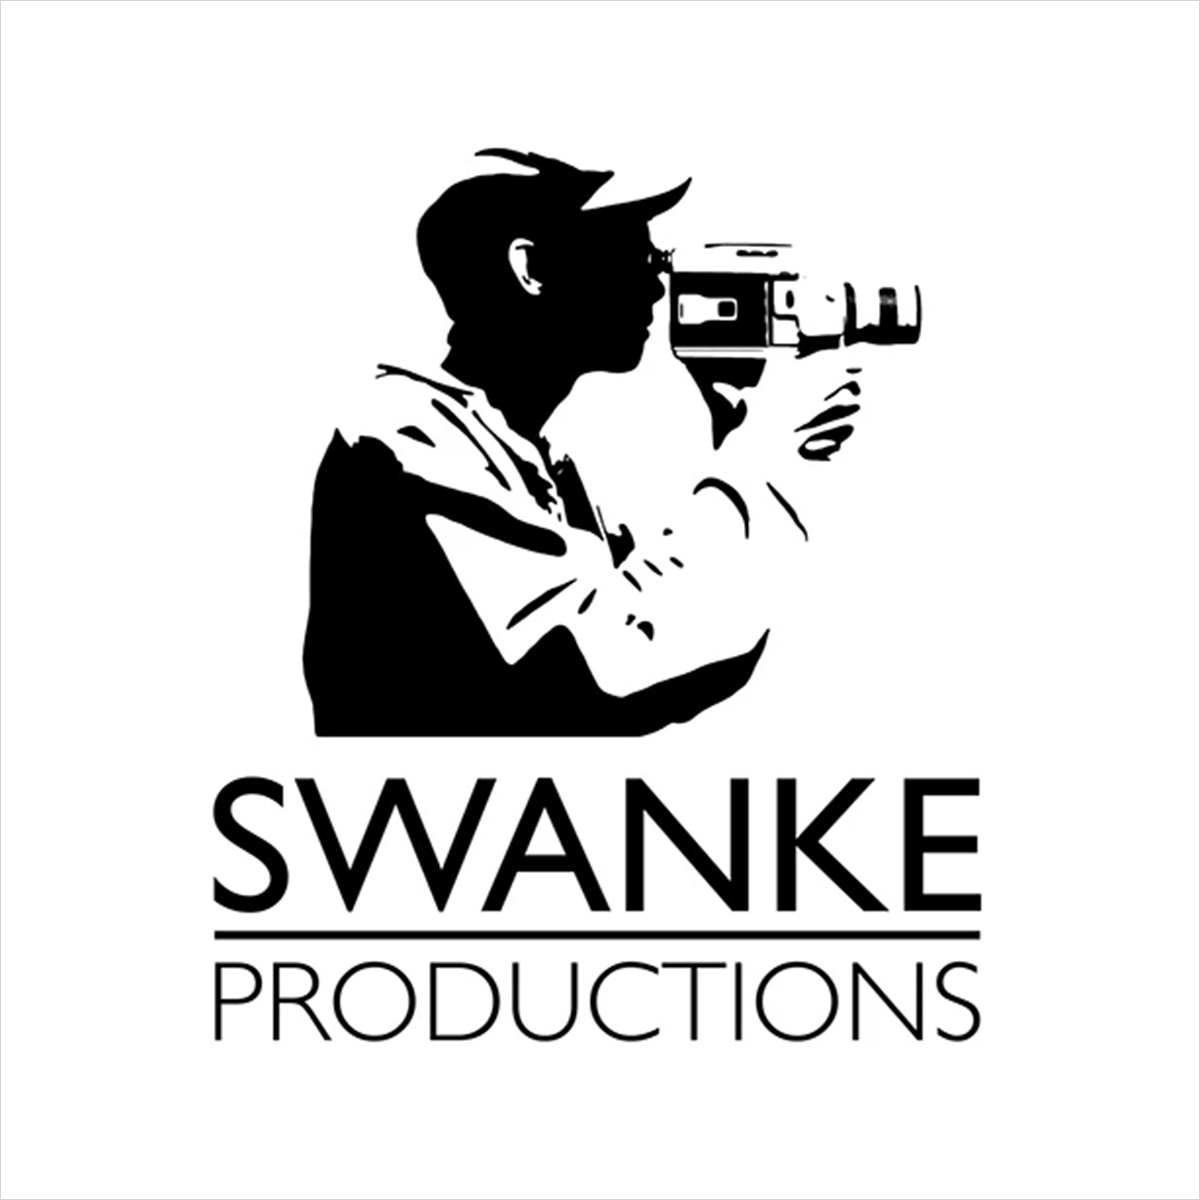 Swanke Productions Logo Design